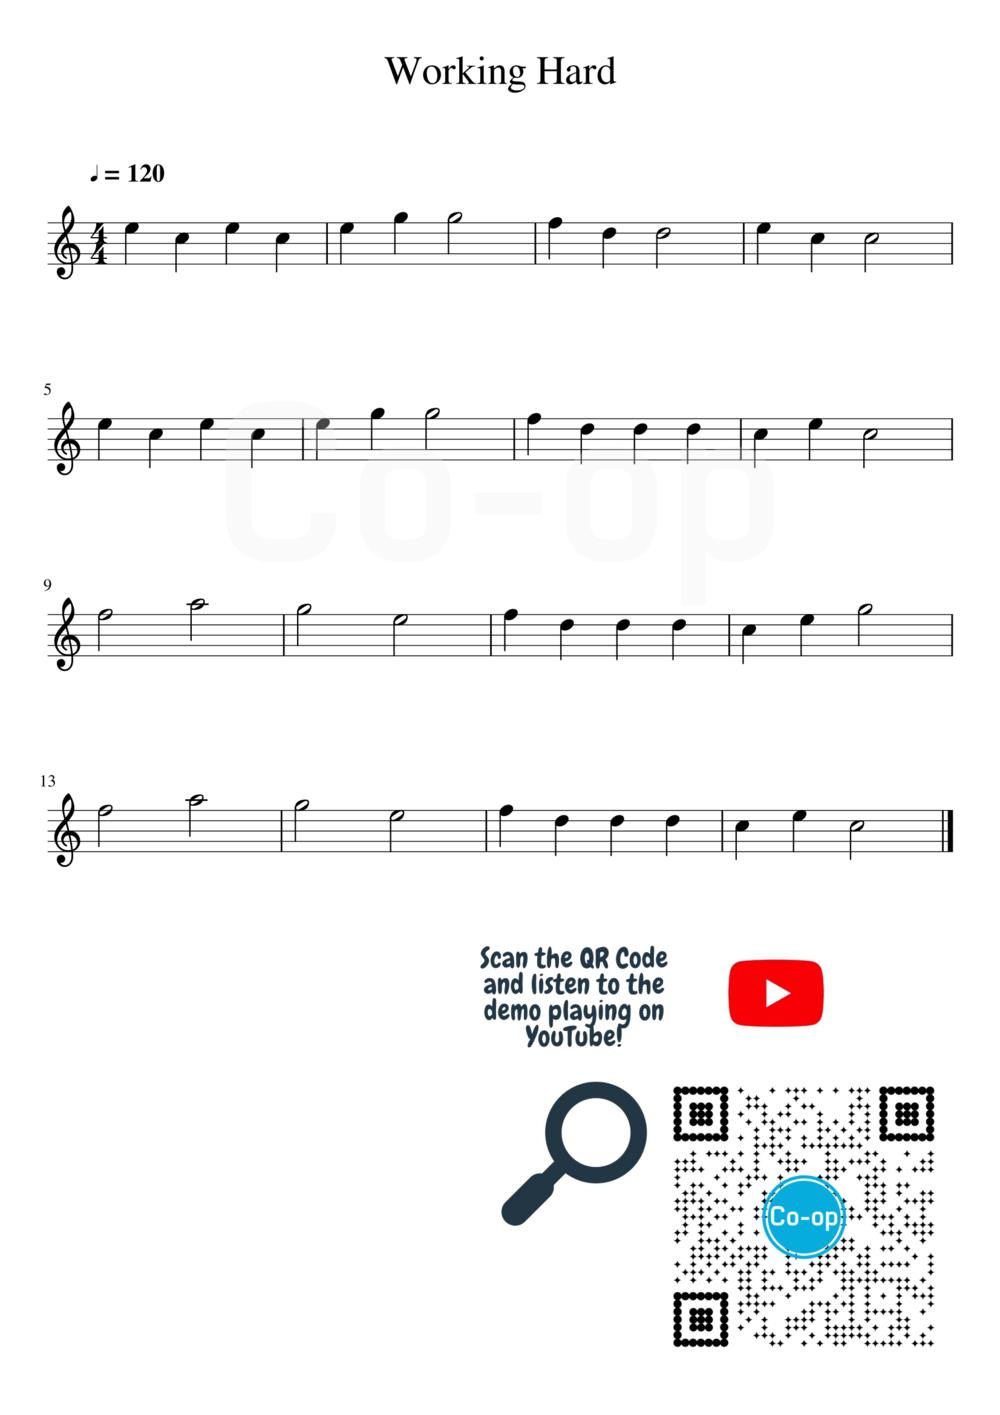 Working Hard | Staff Notation | Free Sheet Music